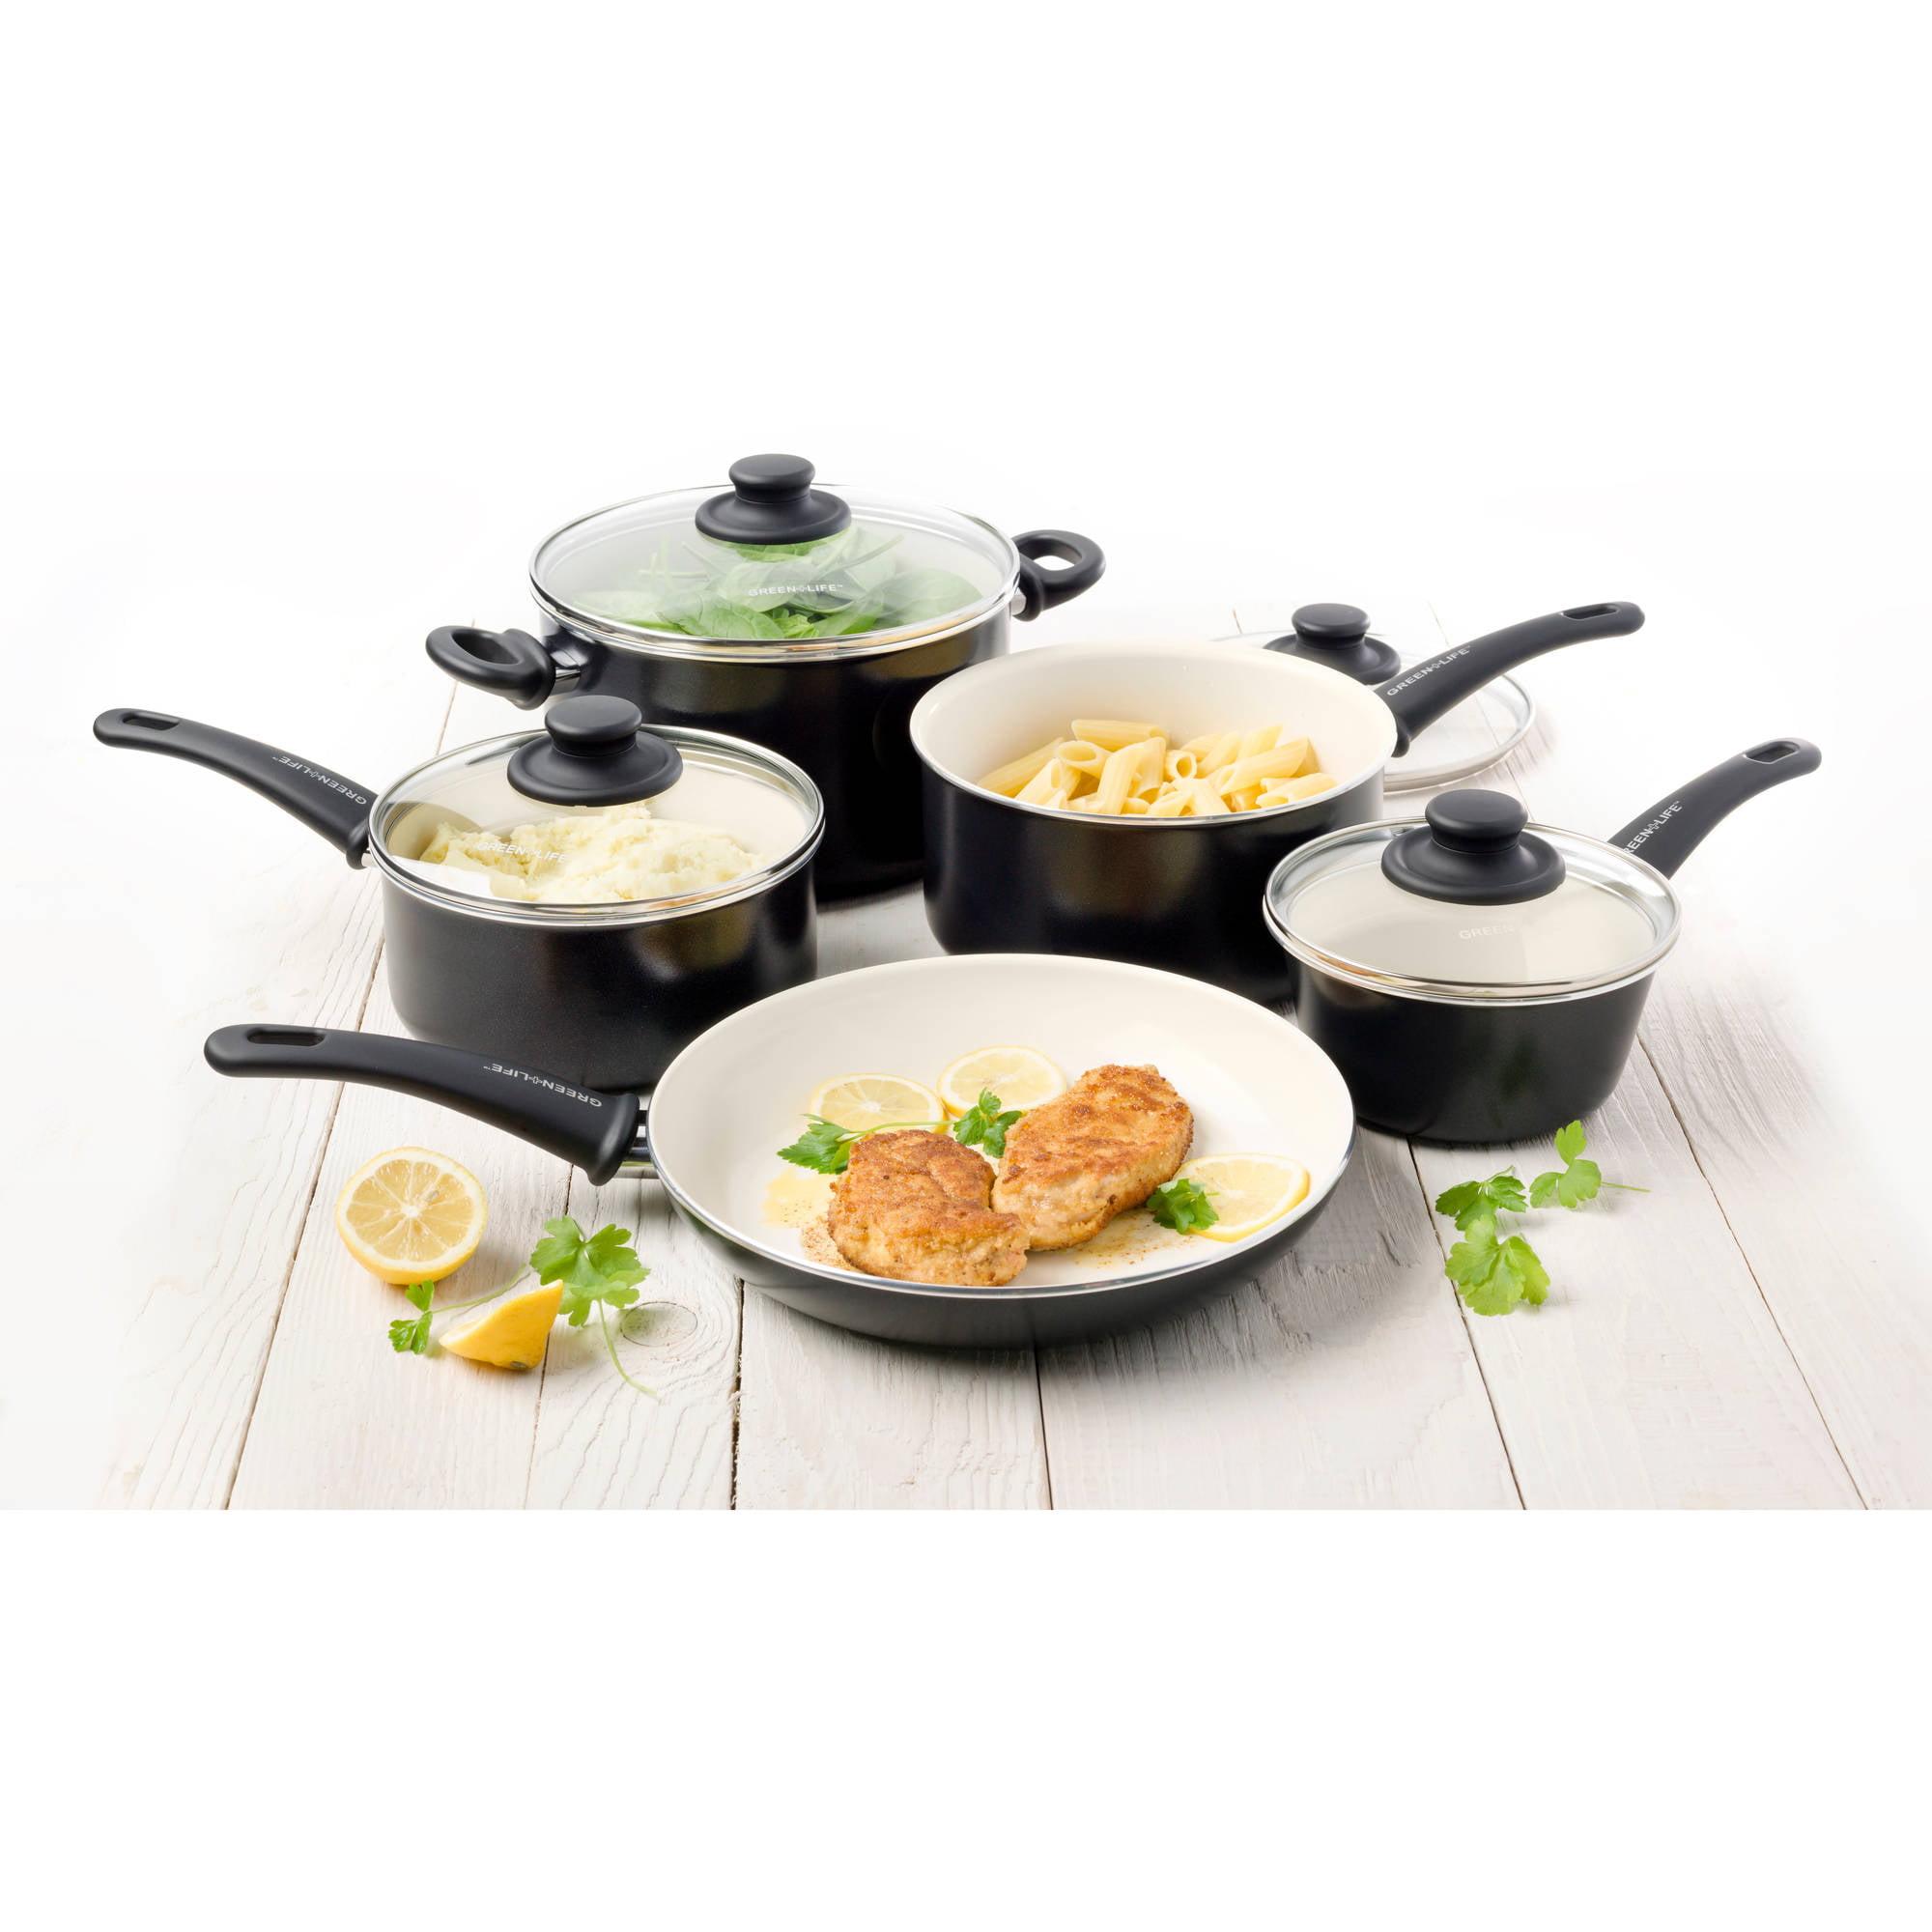 Greenlife Ceramic Non Stick 14 Piece Cookware Set Tupperware Tchef Fry Pan